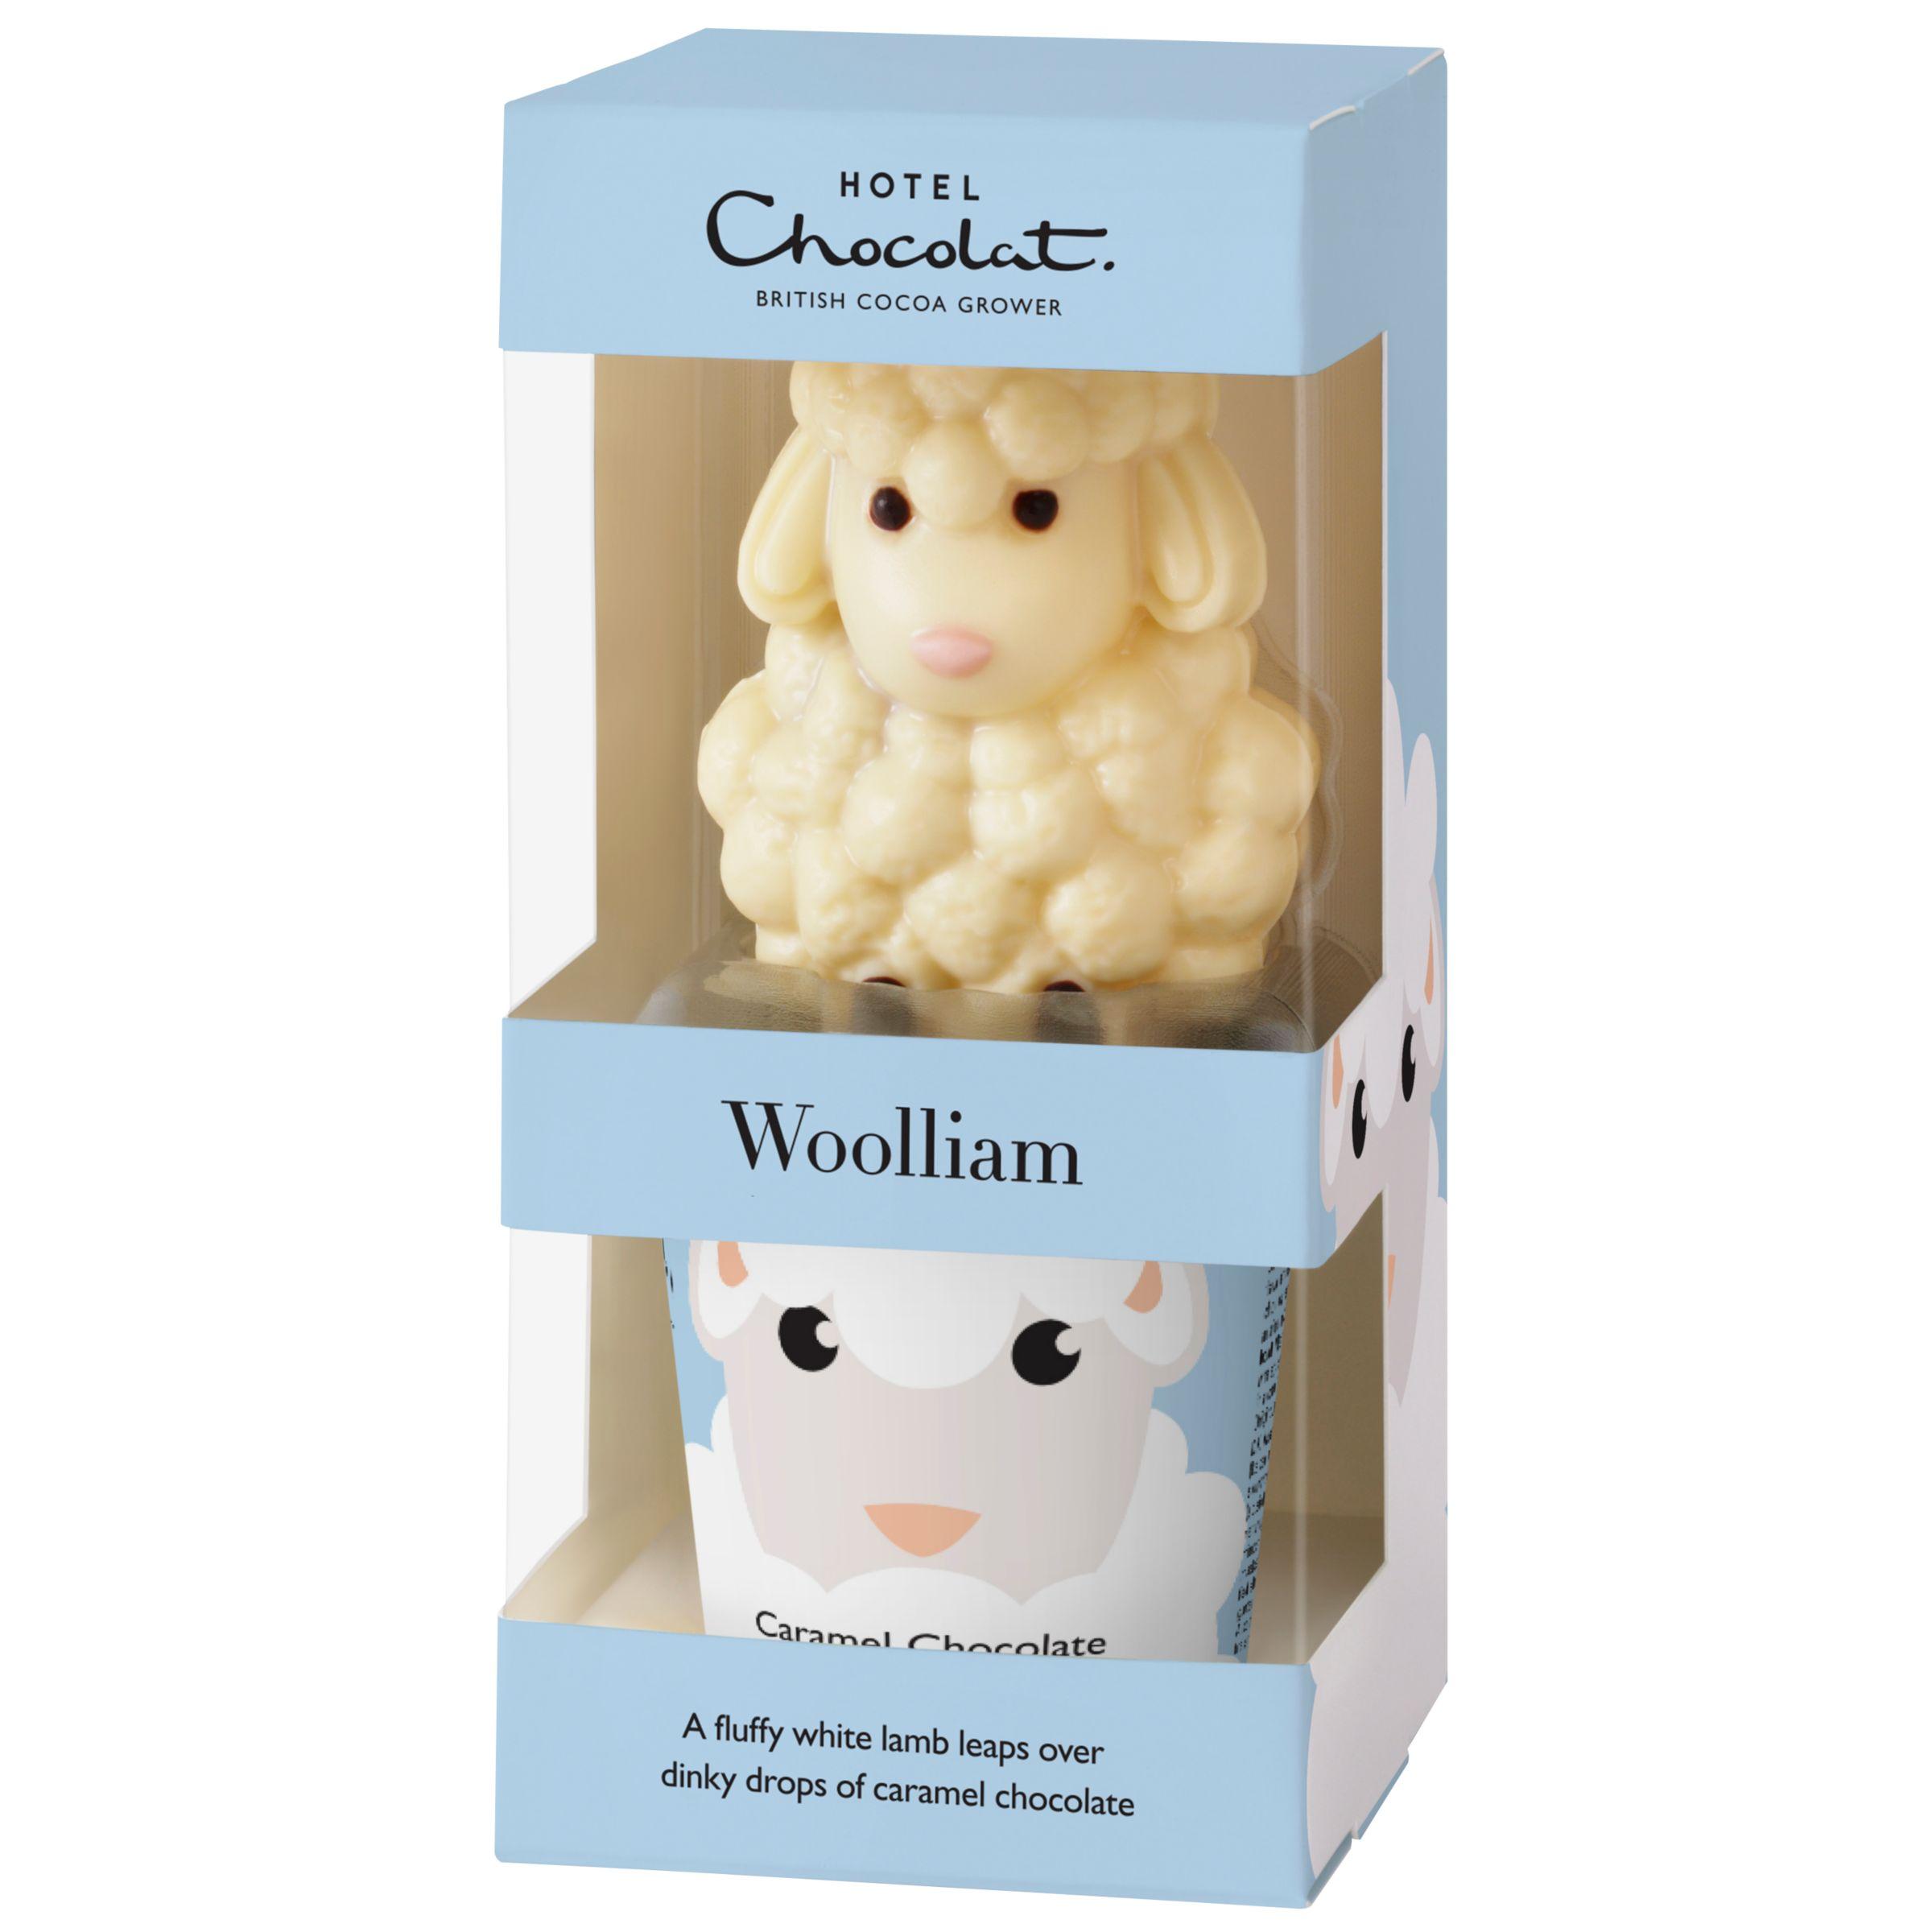 Hotel Chocolat Hotel Chocolat 'Woolliam' White Chocolate Lamb & Caramel Chocolates, 95g